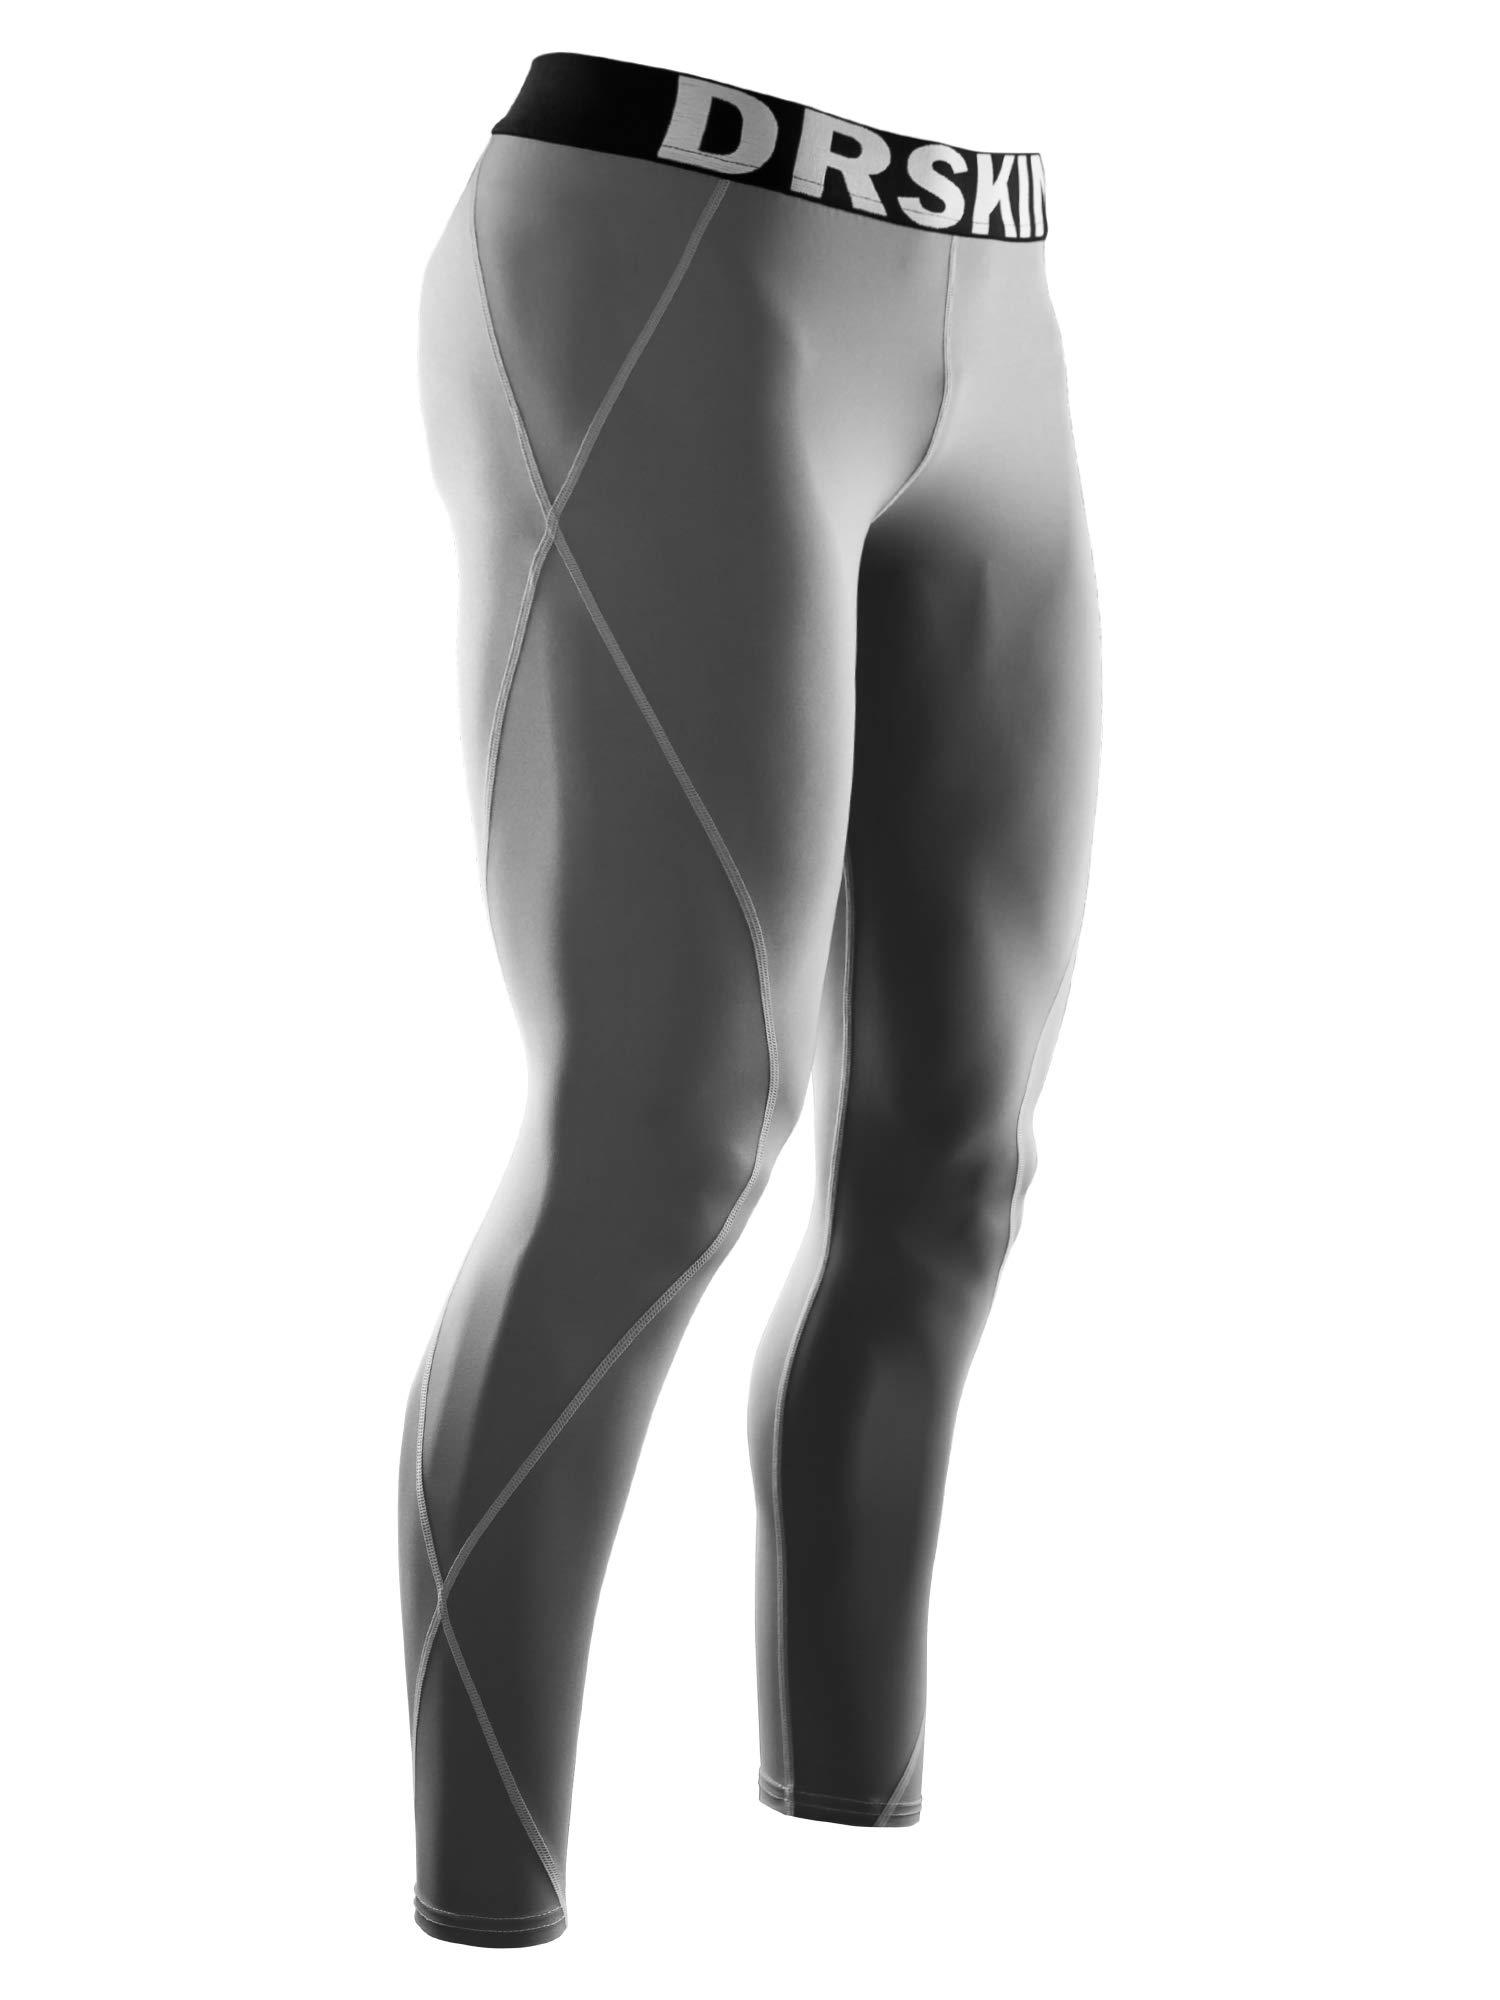 DRSKIN Compression Cool Dry Sports Tights Pants Baselayer Running Leggings Yoga Rashguard Men (3XL, DG03) by DRSKIN